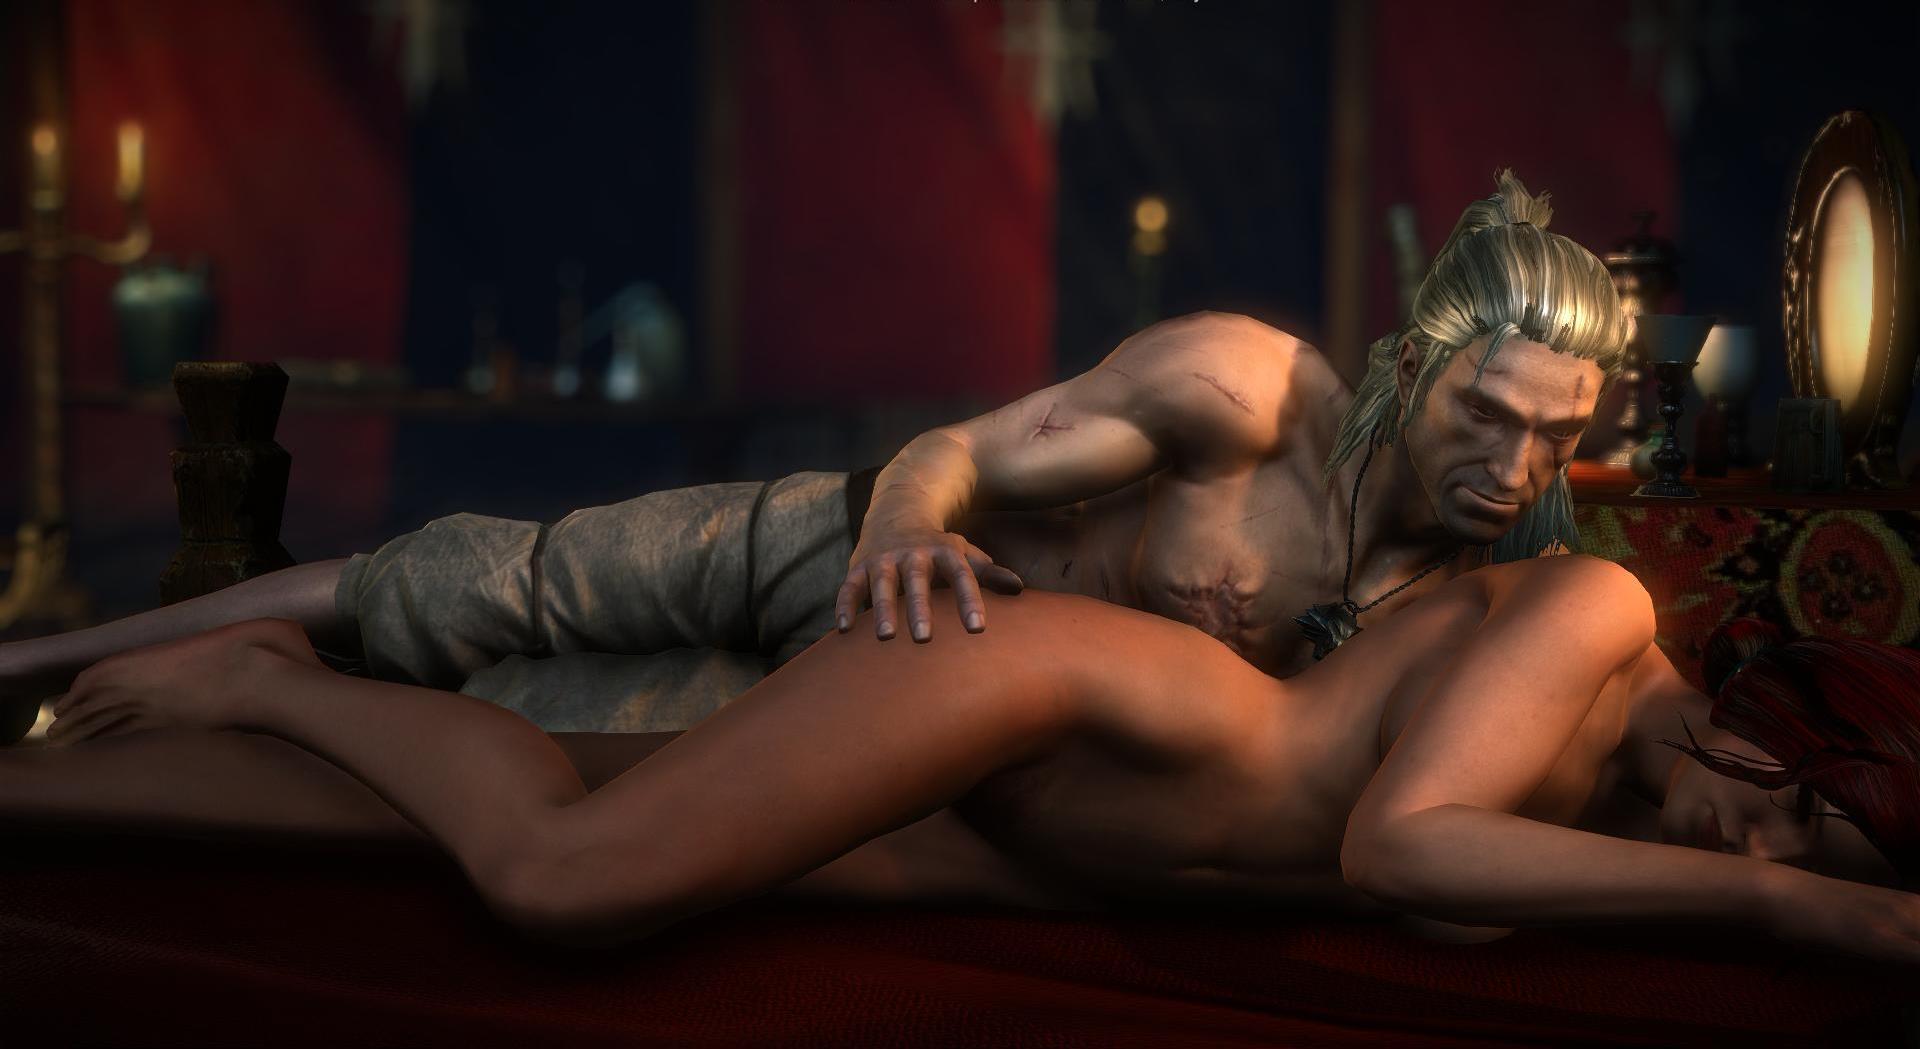 All triss sex scenes